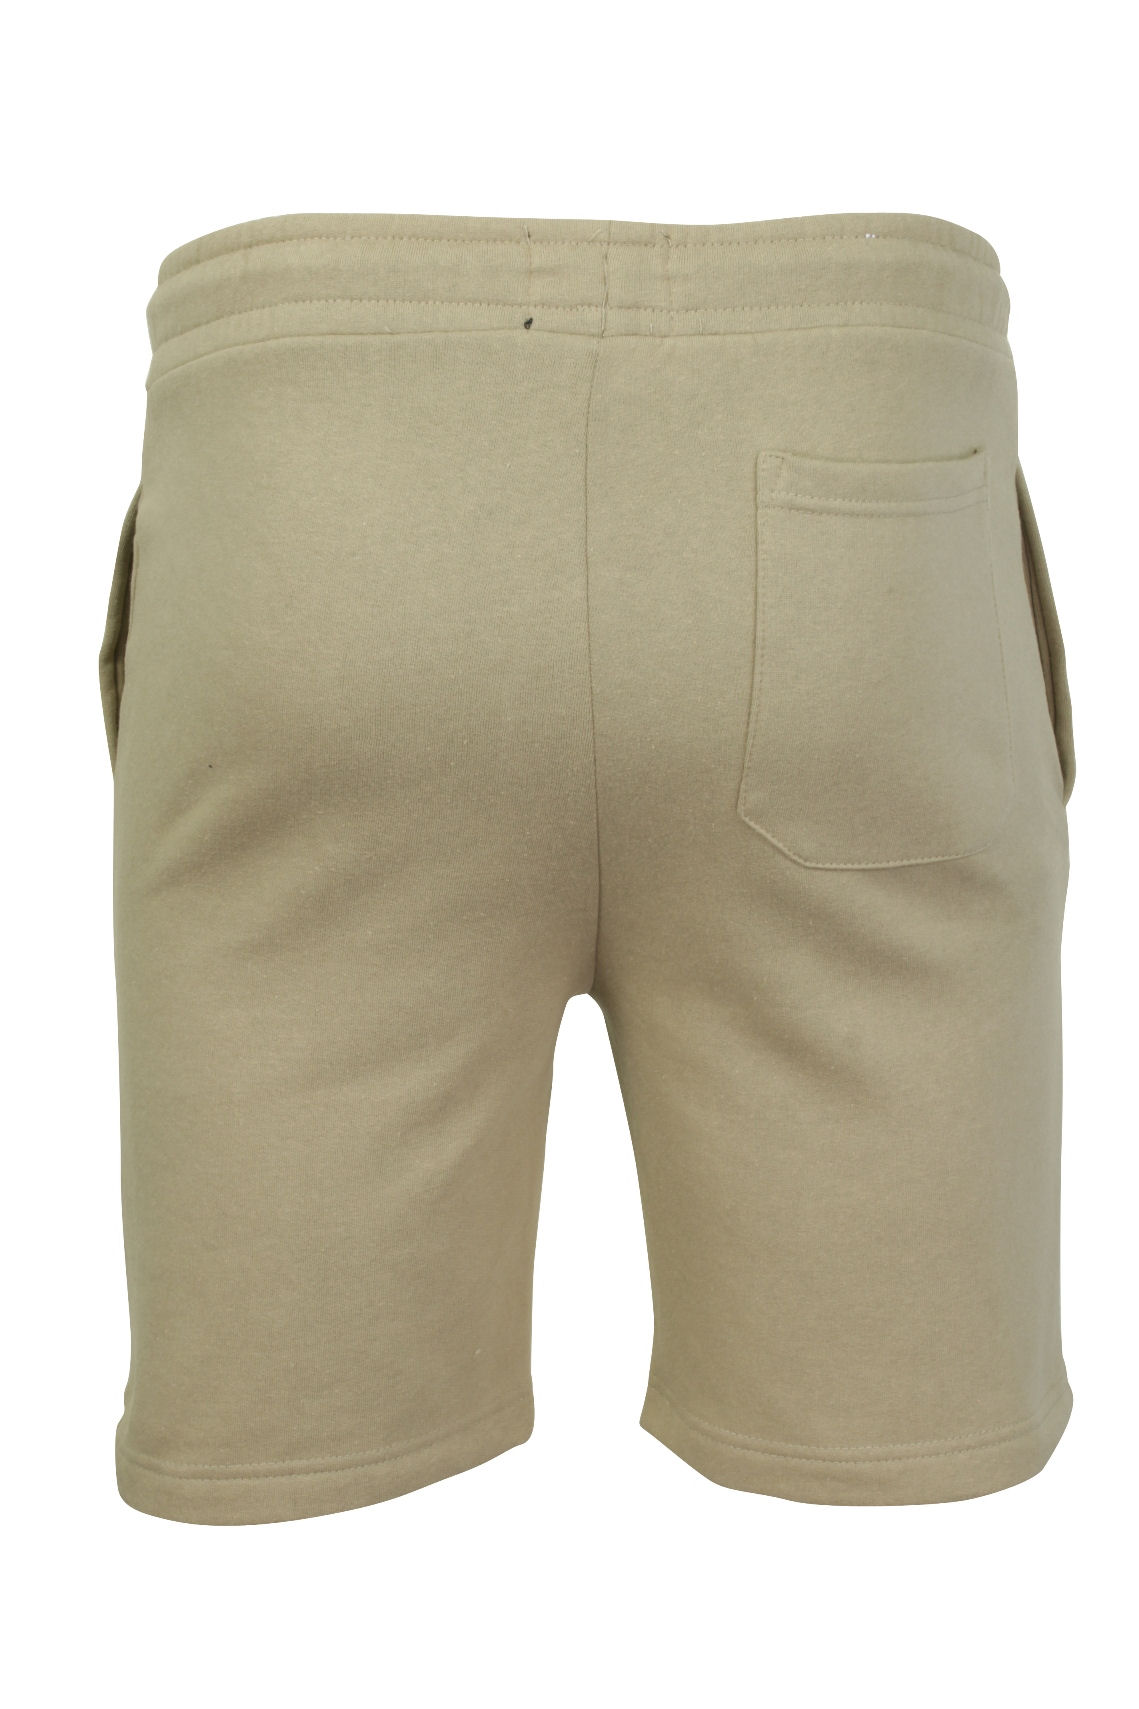 Mens-Jogger-Shorts-Tarley-by-Brave-Soul-Knee-Length-Casual-Fleece-Lined-Summer thumbnail 39